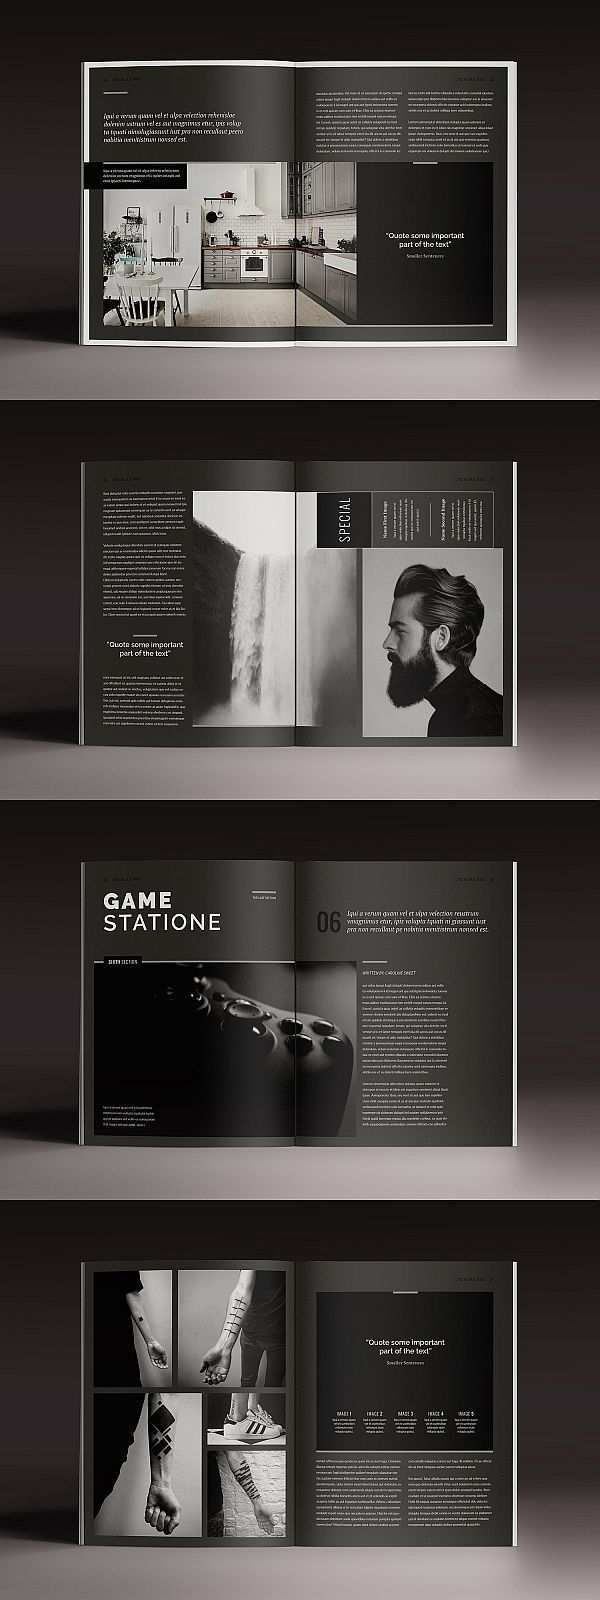 Blackazine Magazin Vorlage Magazine Broschure Broschure Broschure Br Blackazine Br Br Indesign Vorlage Editorial Design Layouts Indesign Vorlagen